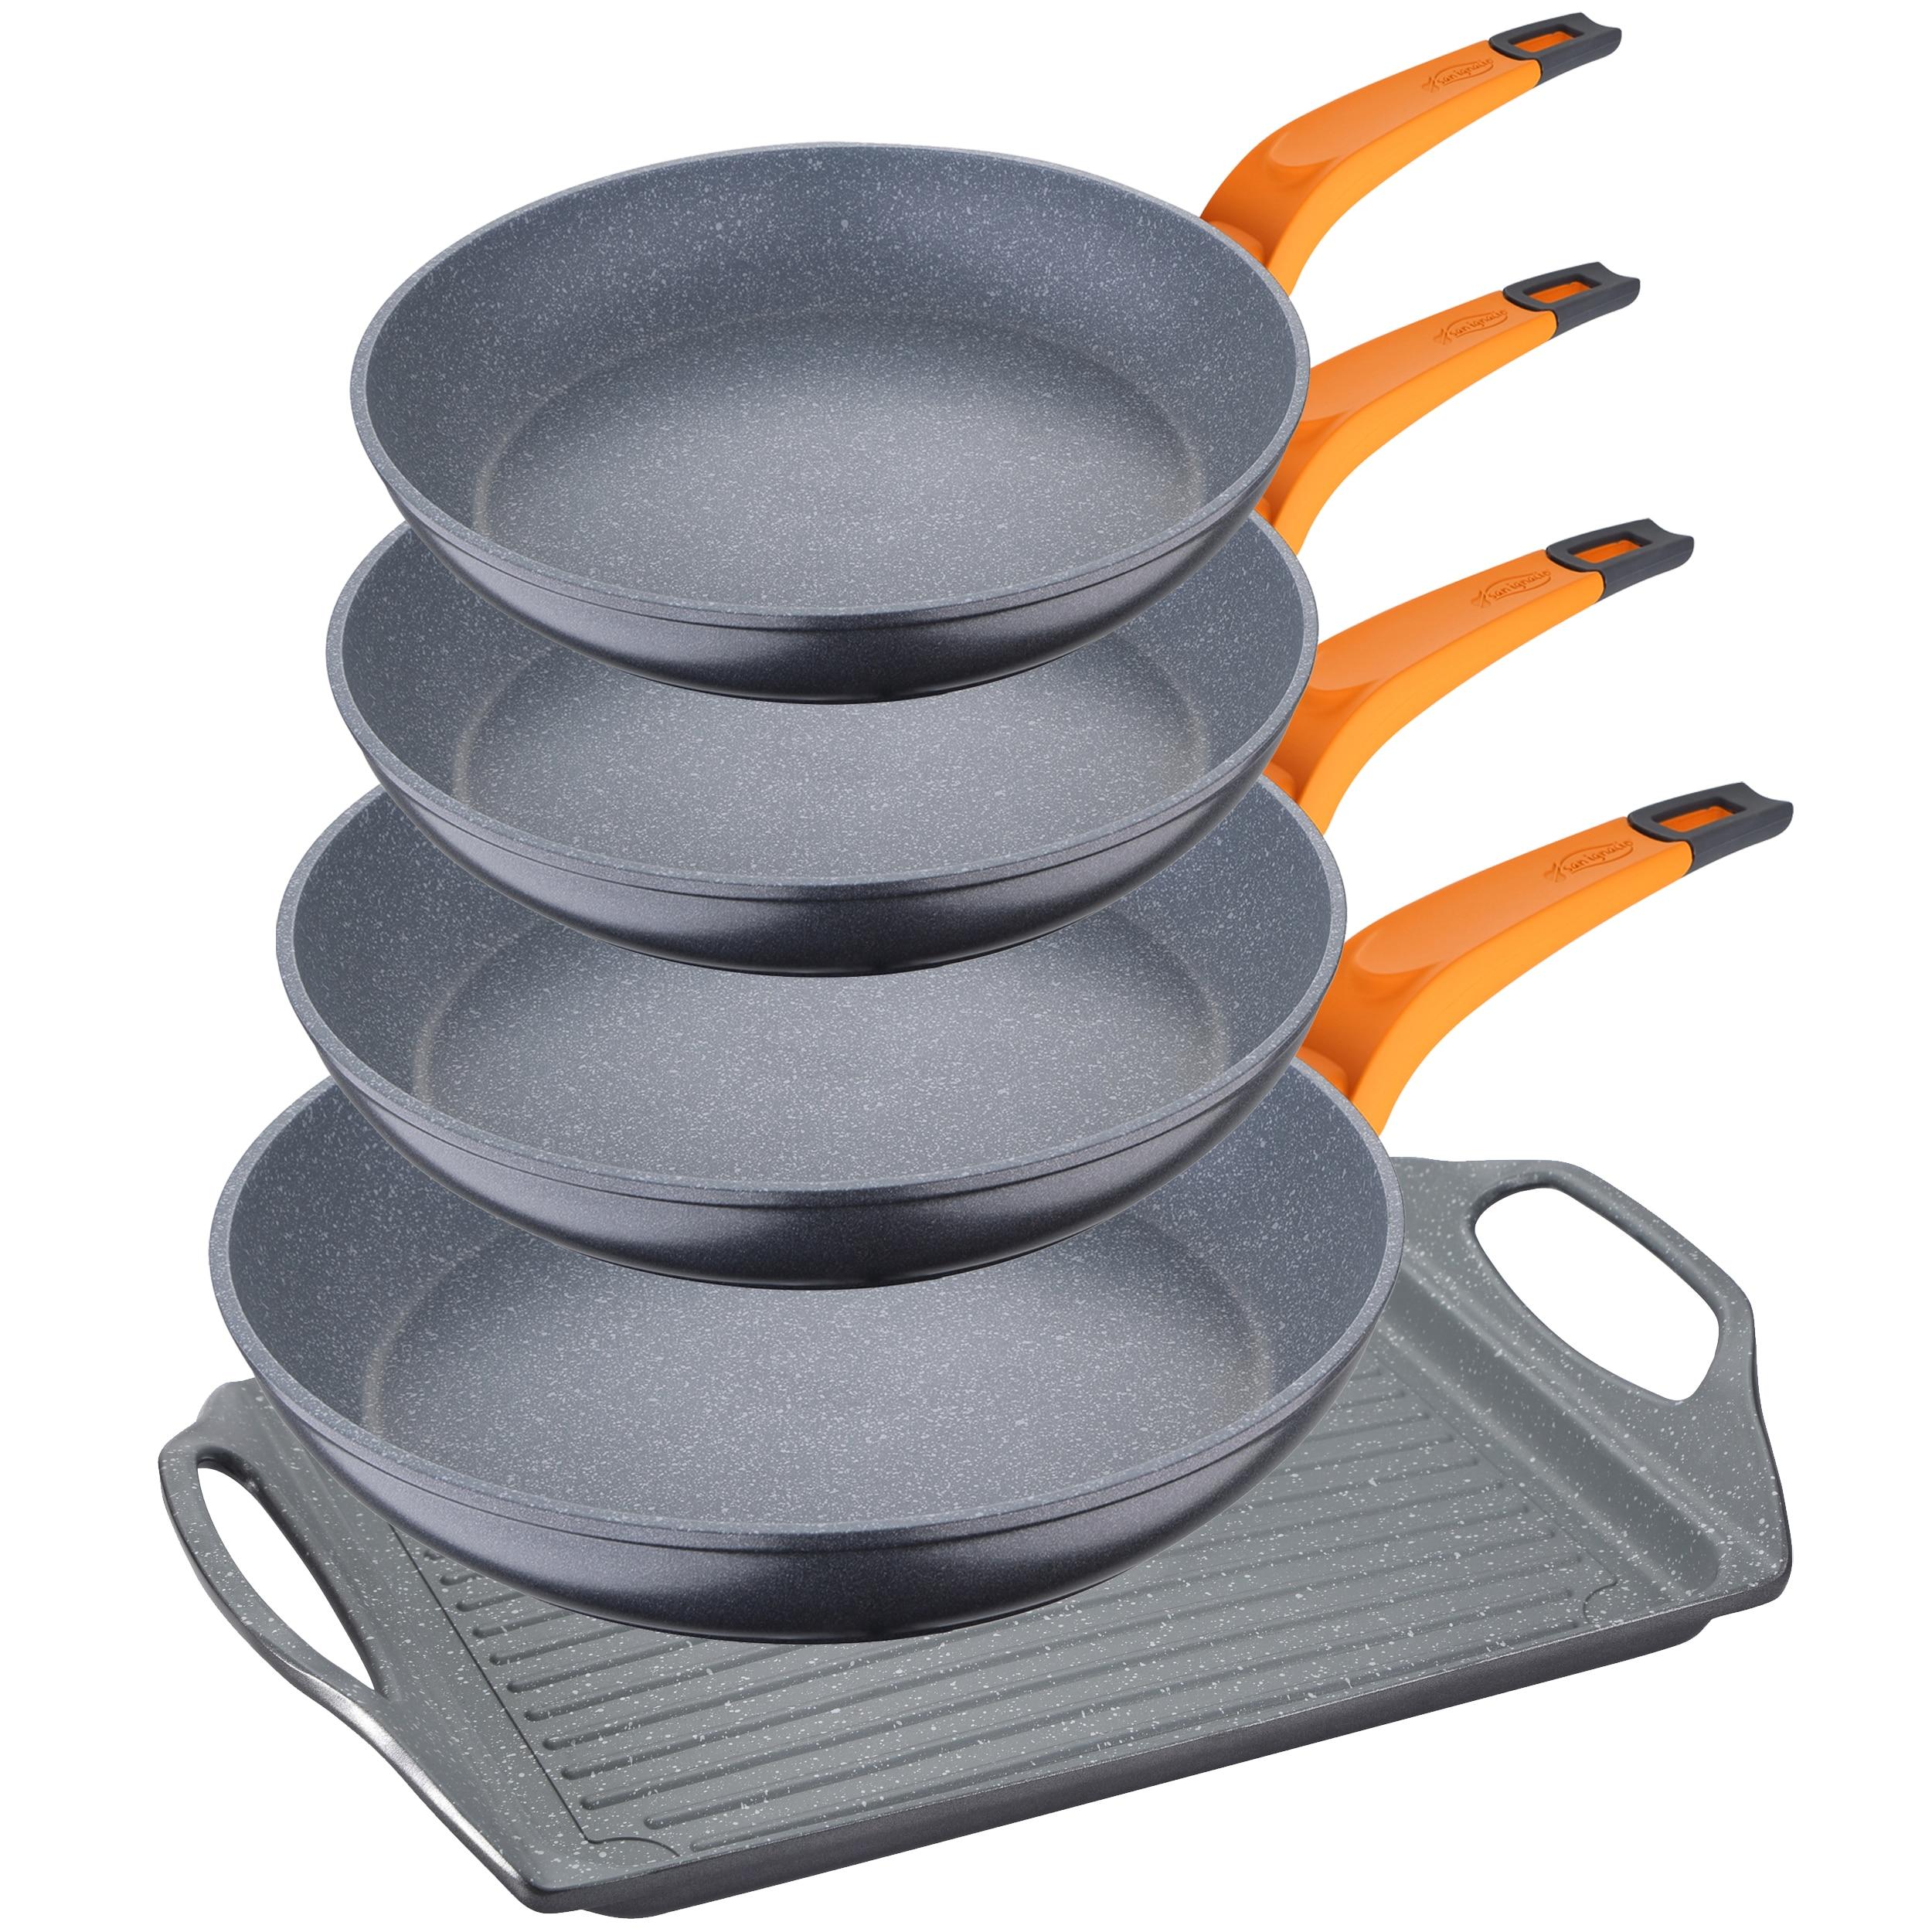 Juego De Sauce Pans In Aluminum To Choose SAN Ignacio Collection Lava